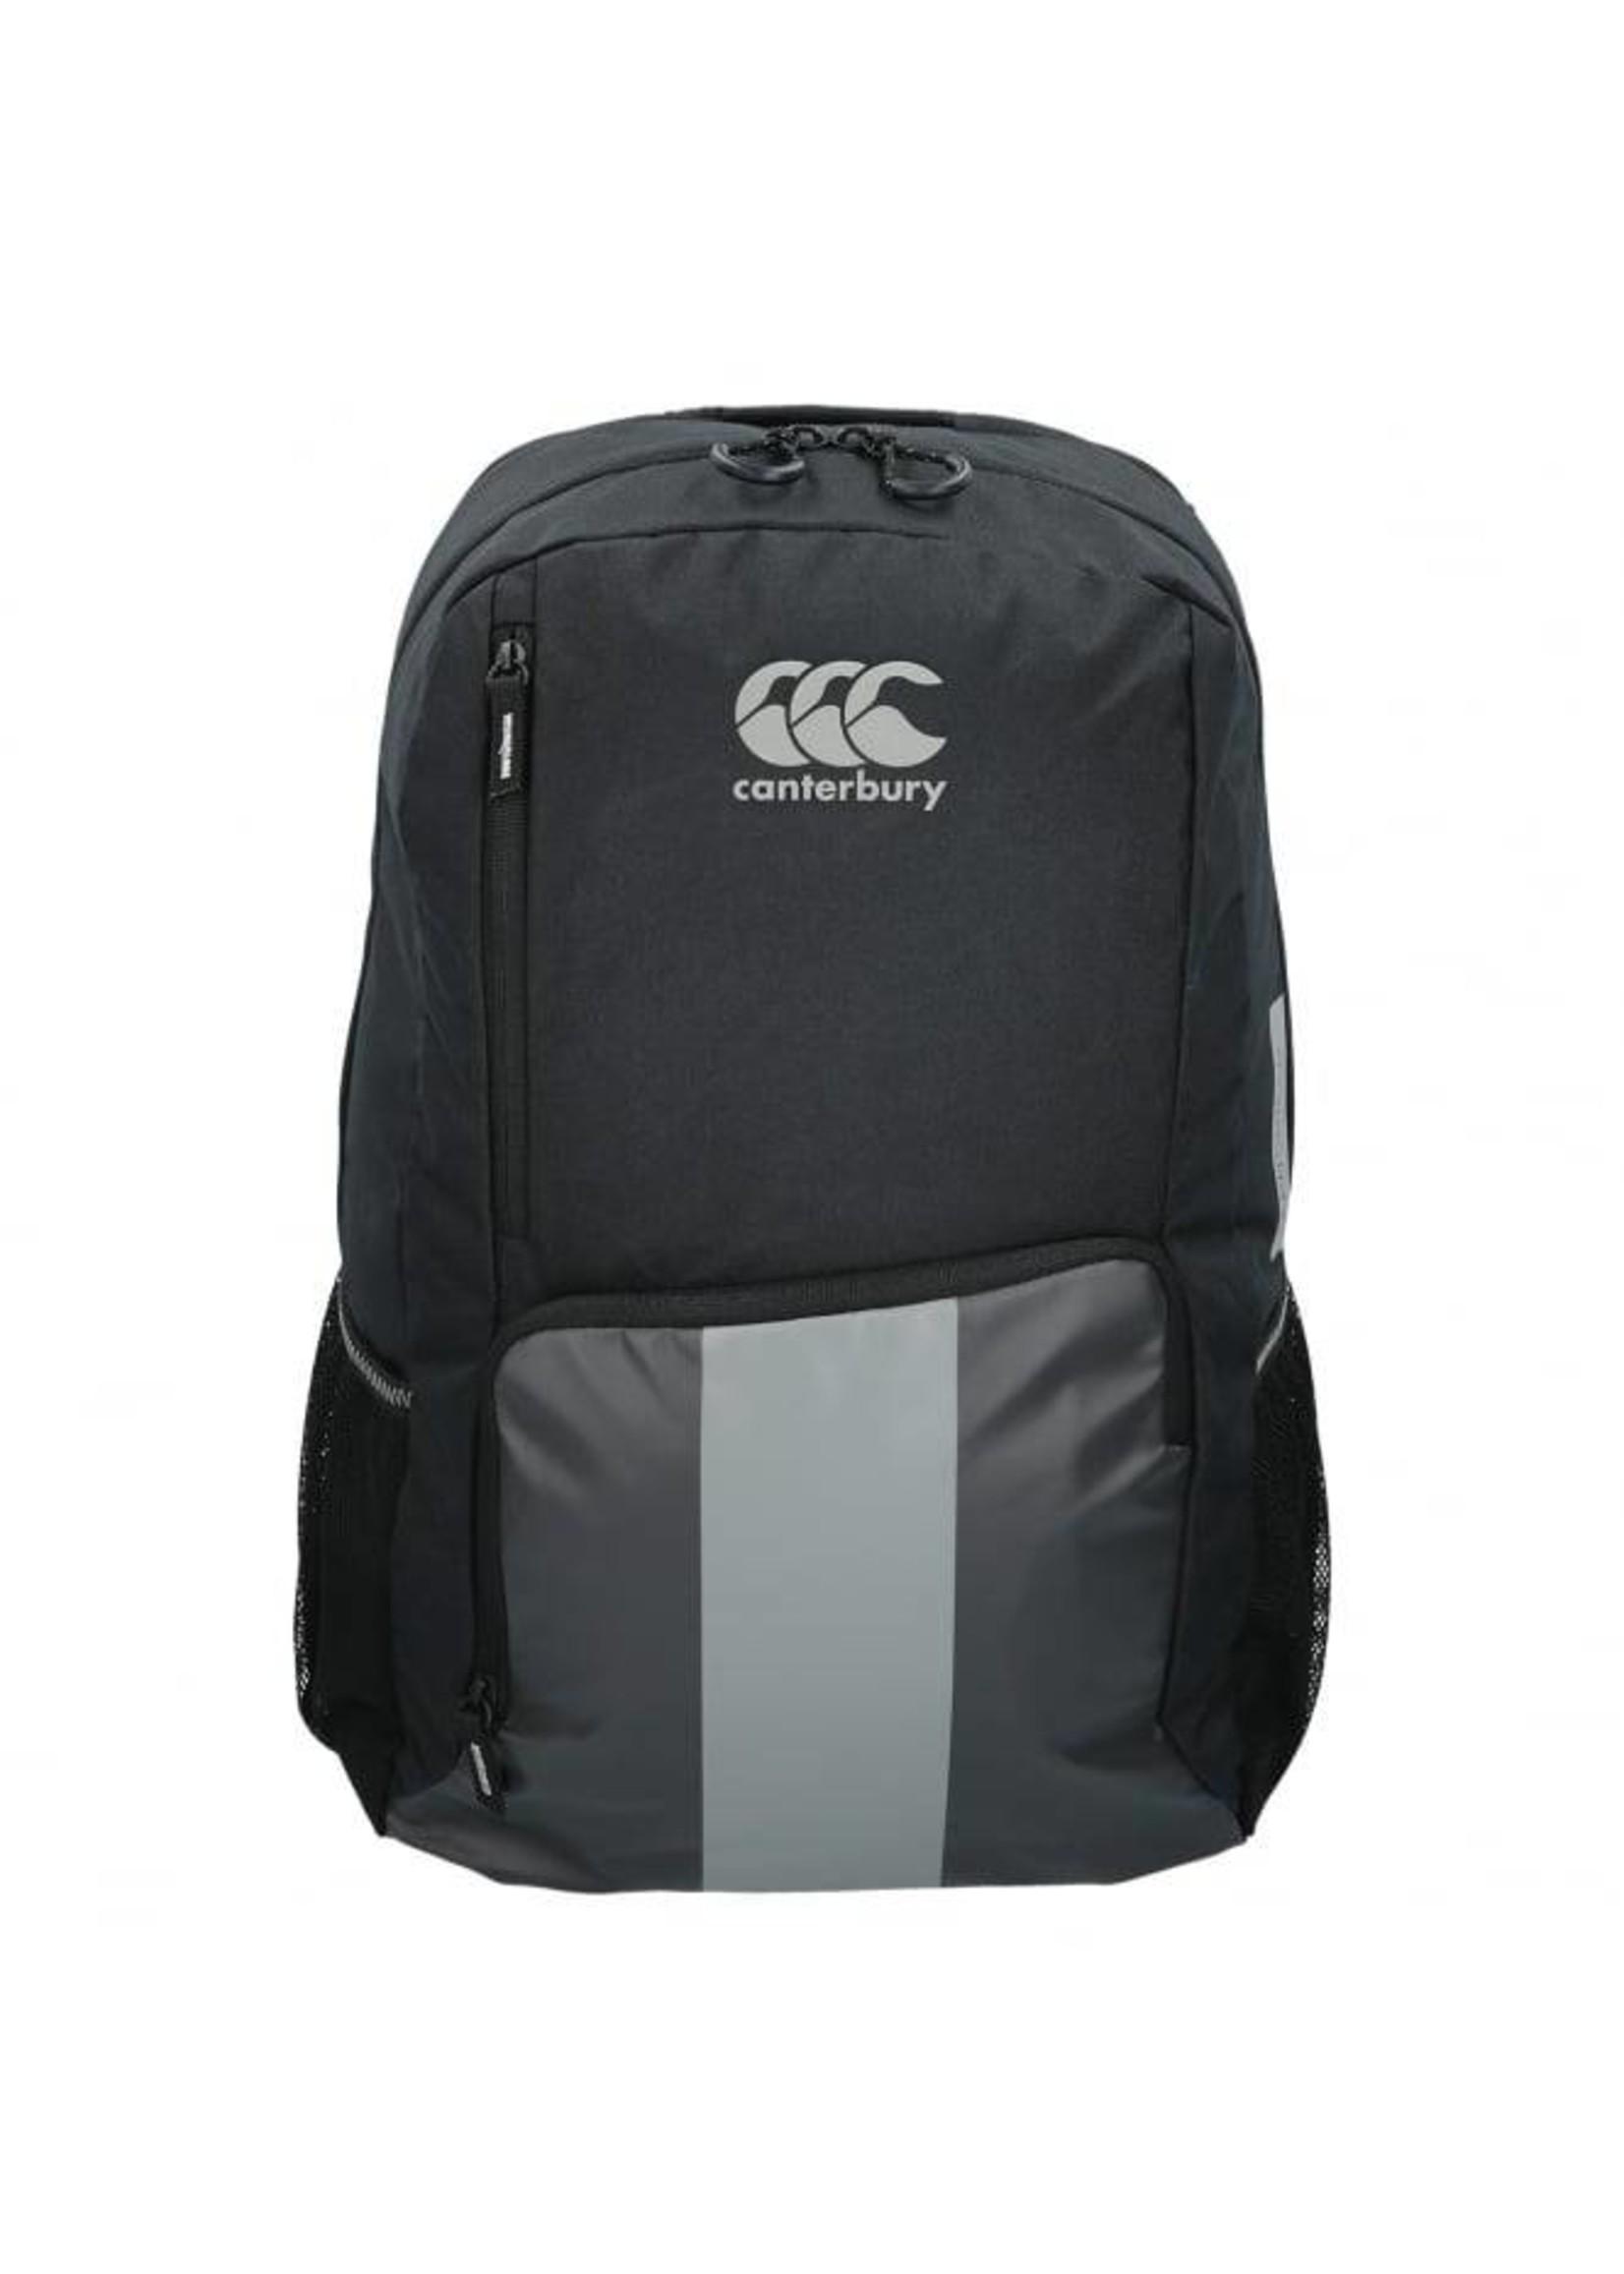 Canterbury Canterbury Vaposhield Medium Backpack, Black (2018)